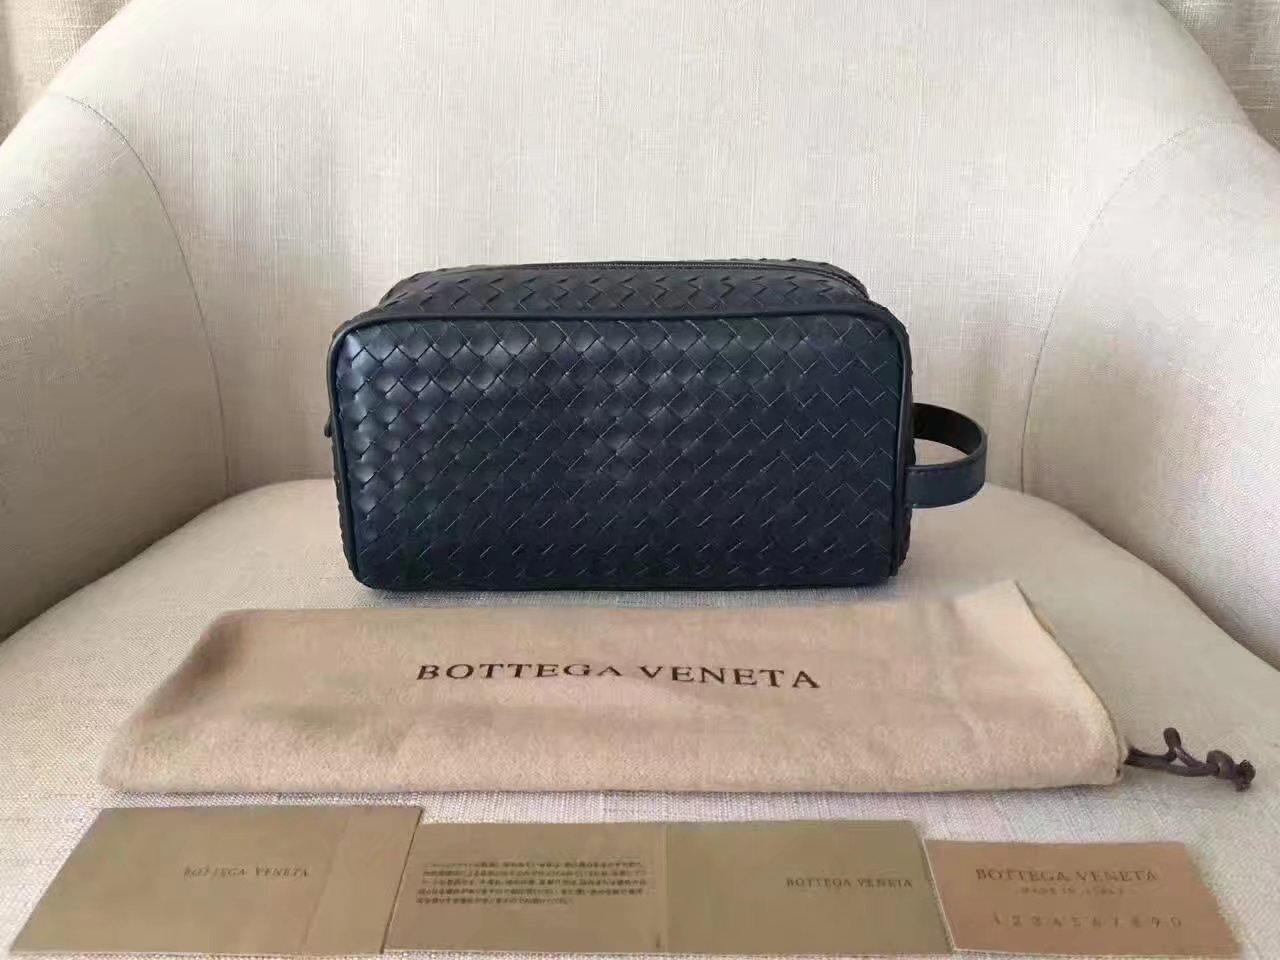 Bottega Veneta Multifunctional Leather Clutch Bag Black